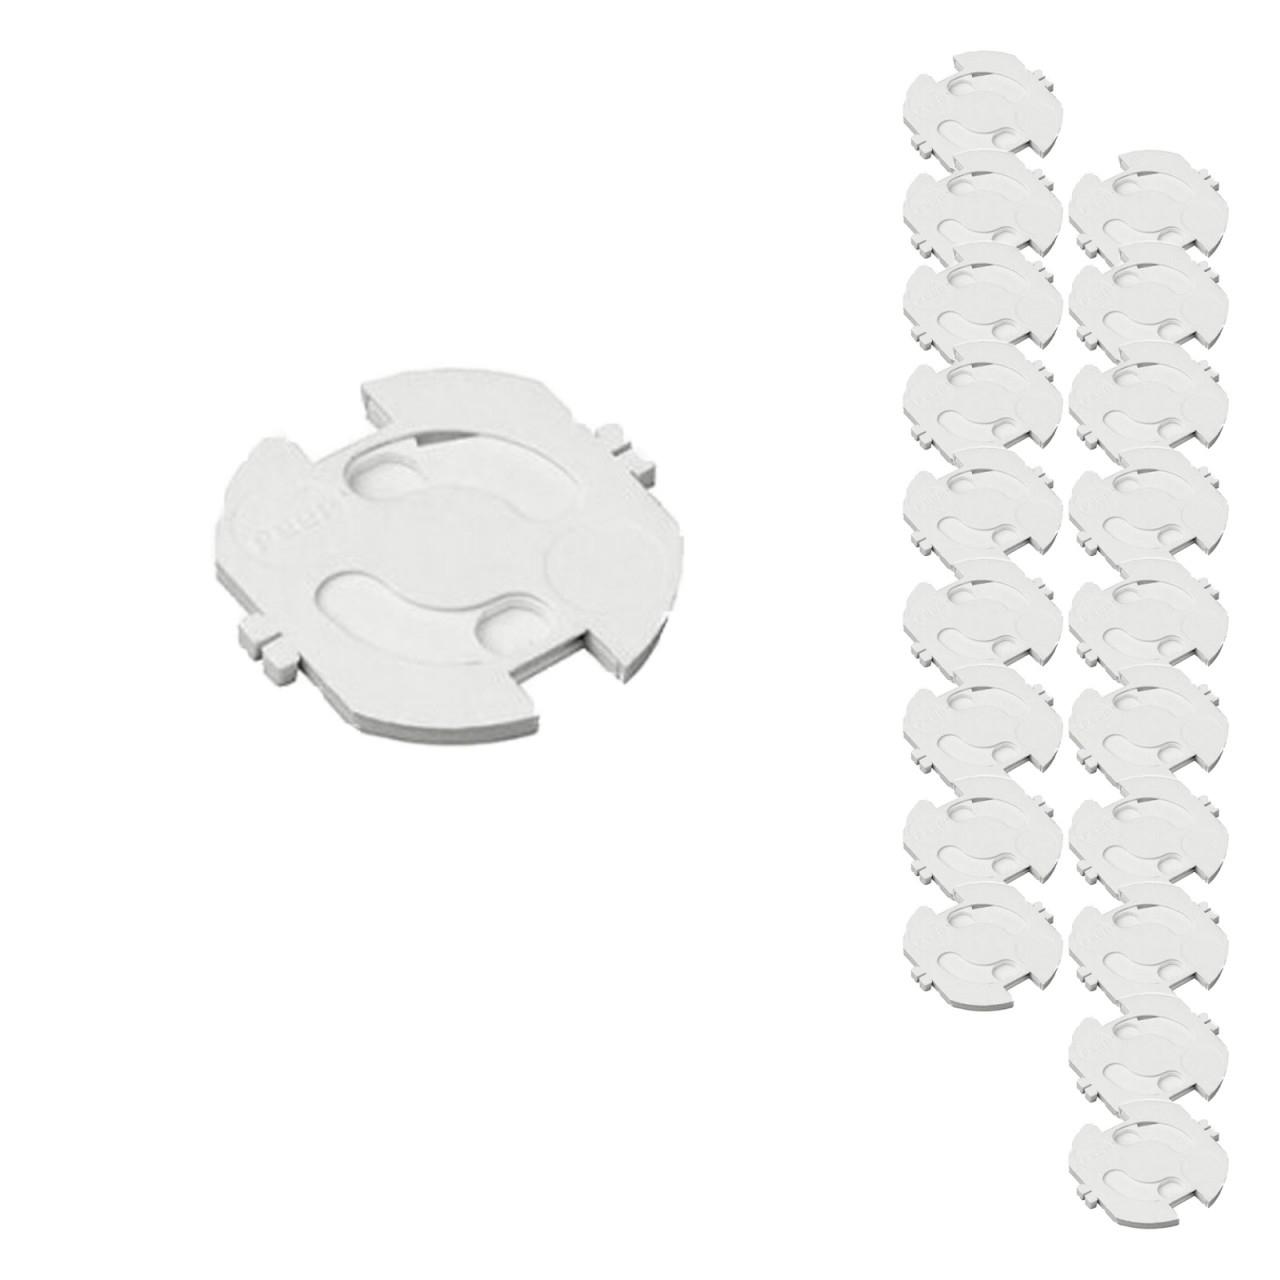 20 Stück H+H KS 10 Steckdosensicherung, Weiß